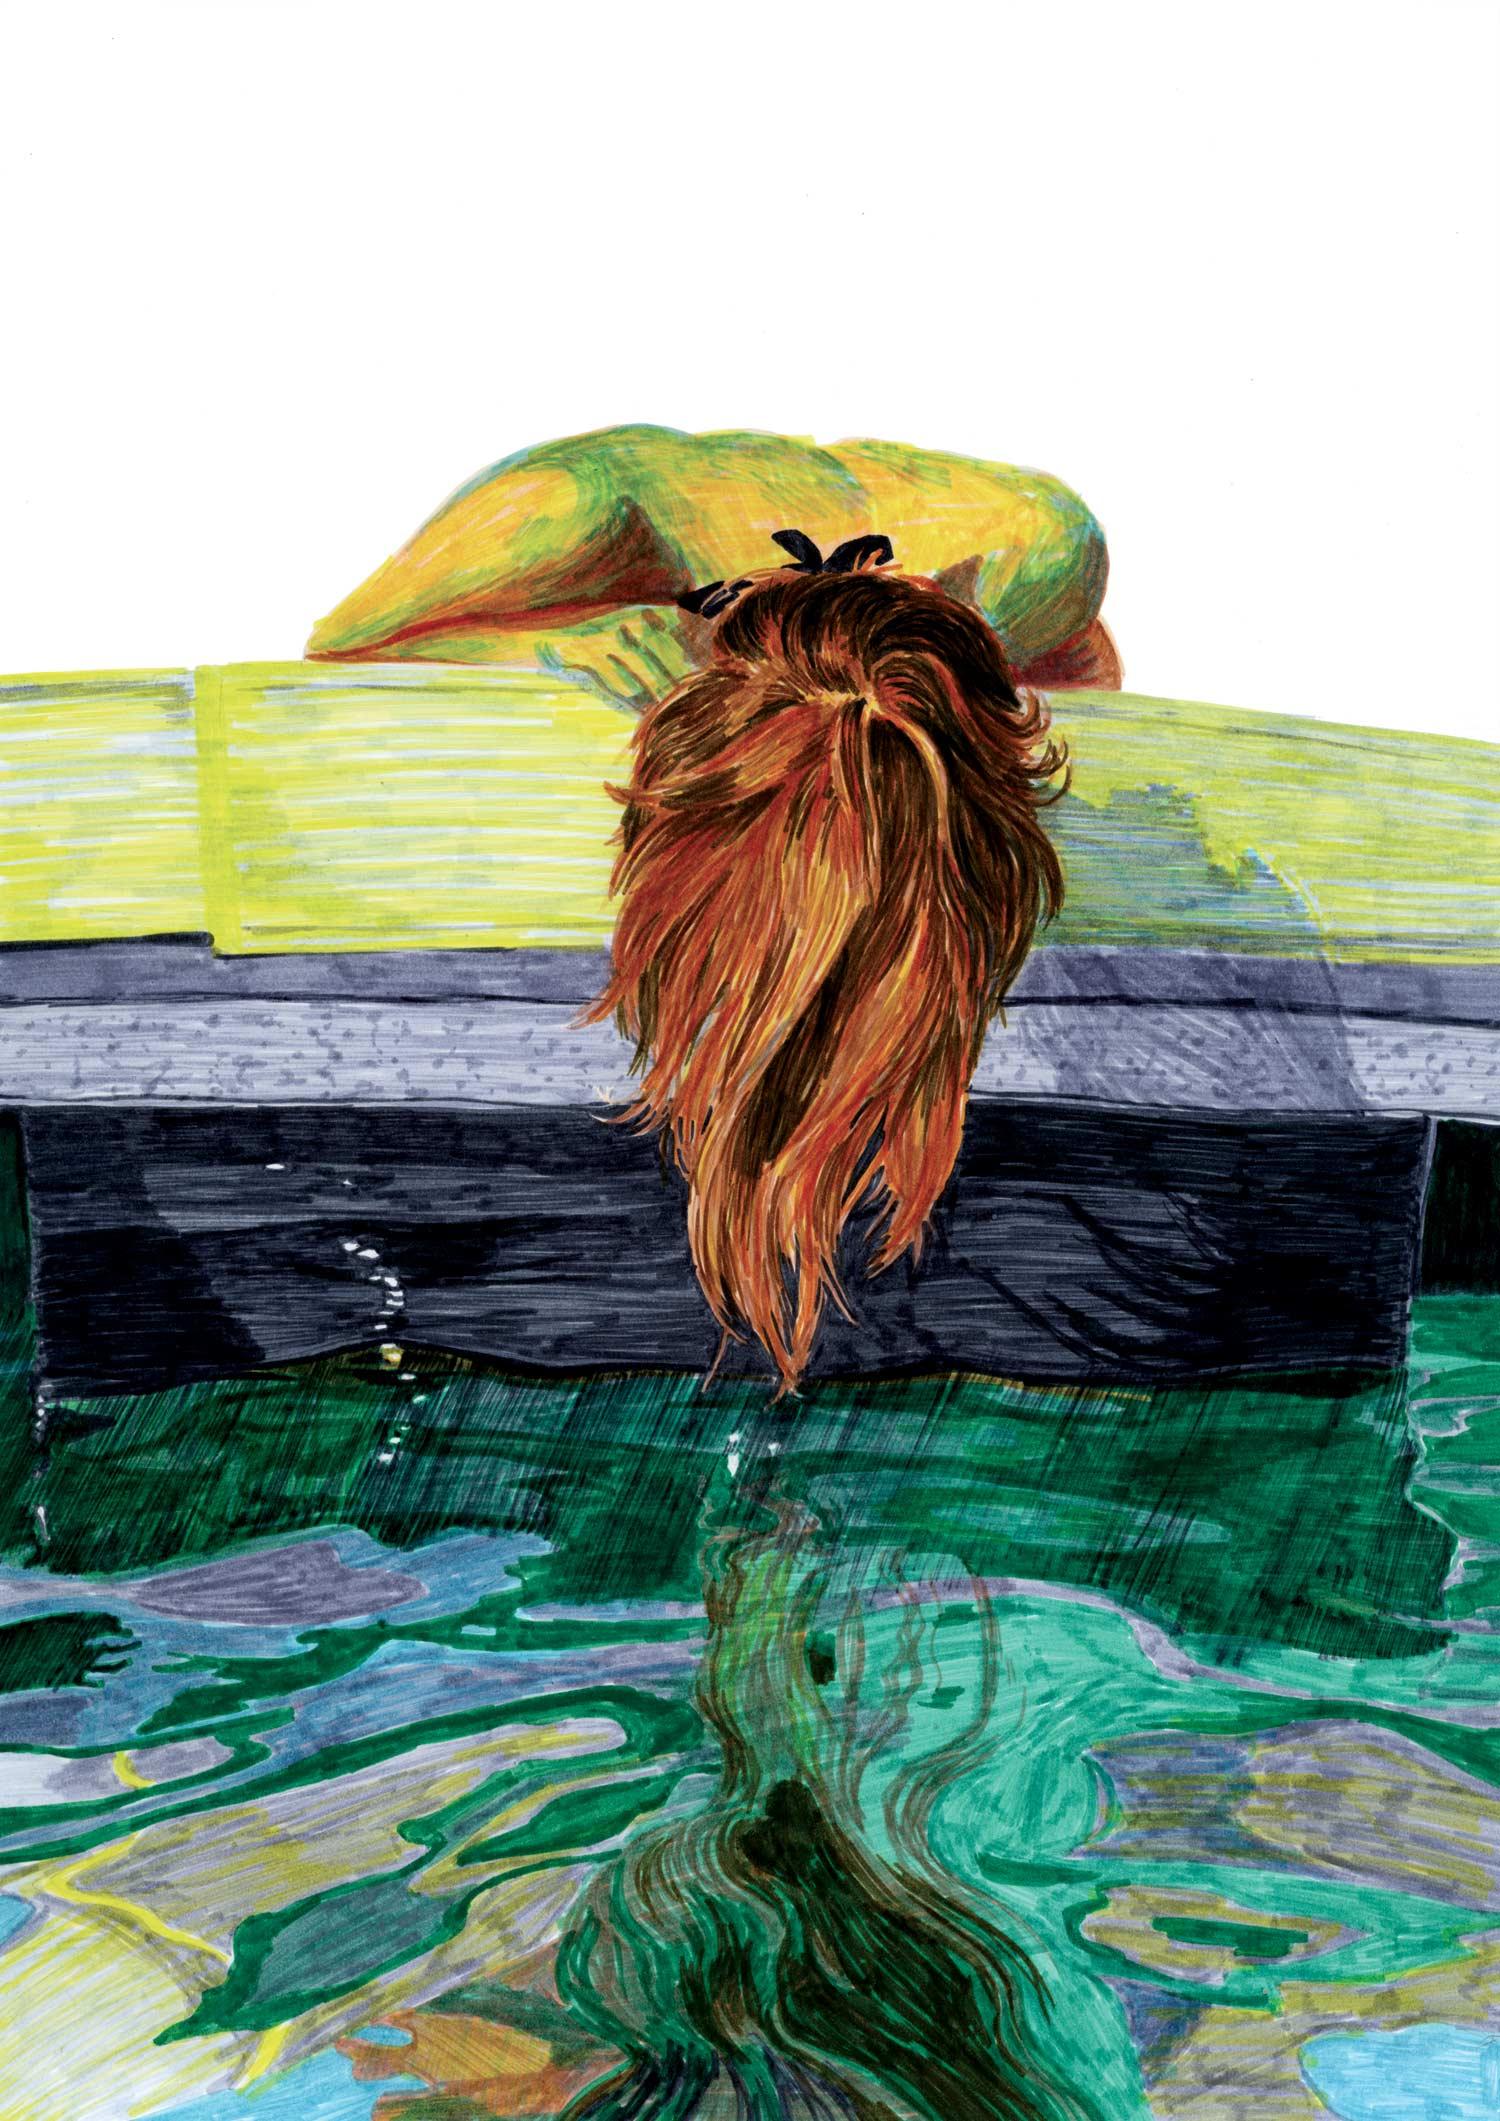 eau_mer_reflet_femme_cheveux_illustration_feutre_molesti